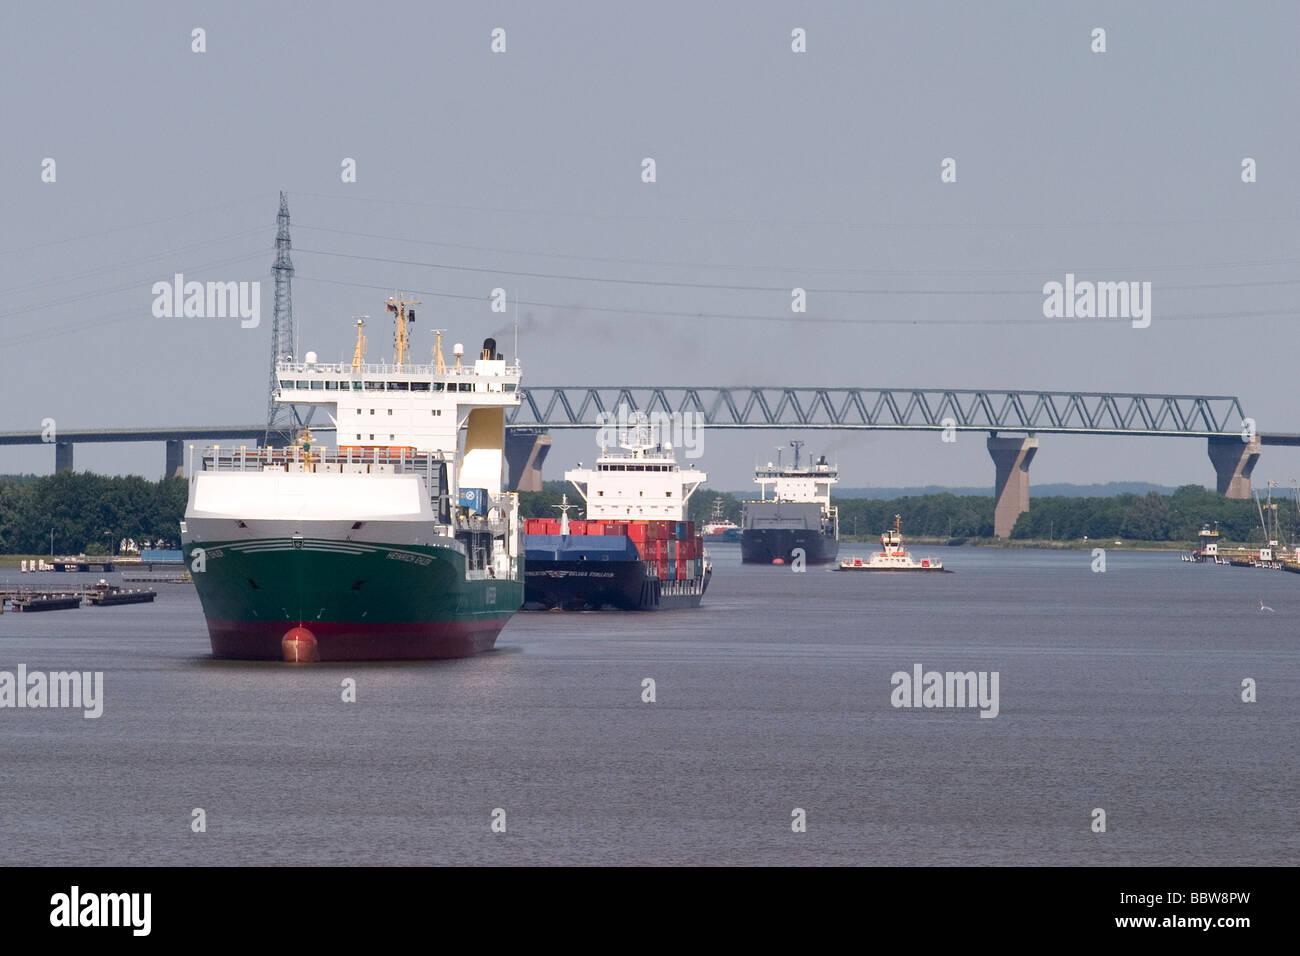 Germany Schleswig-Holstein Kiel canal, ships queue to enter Brunsbüttel lock - Stock Image